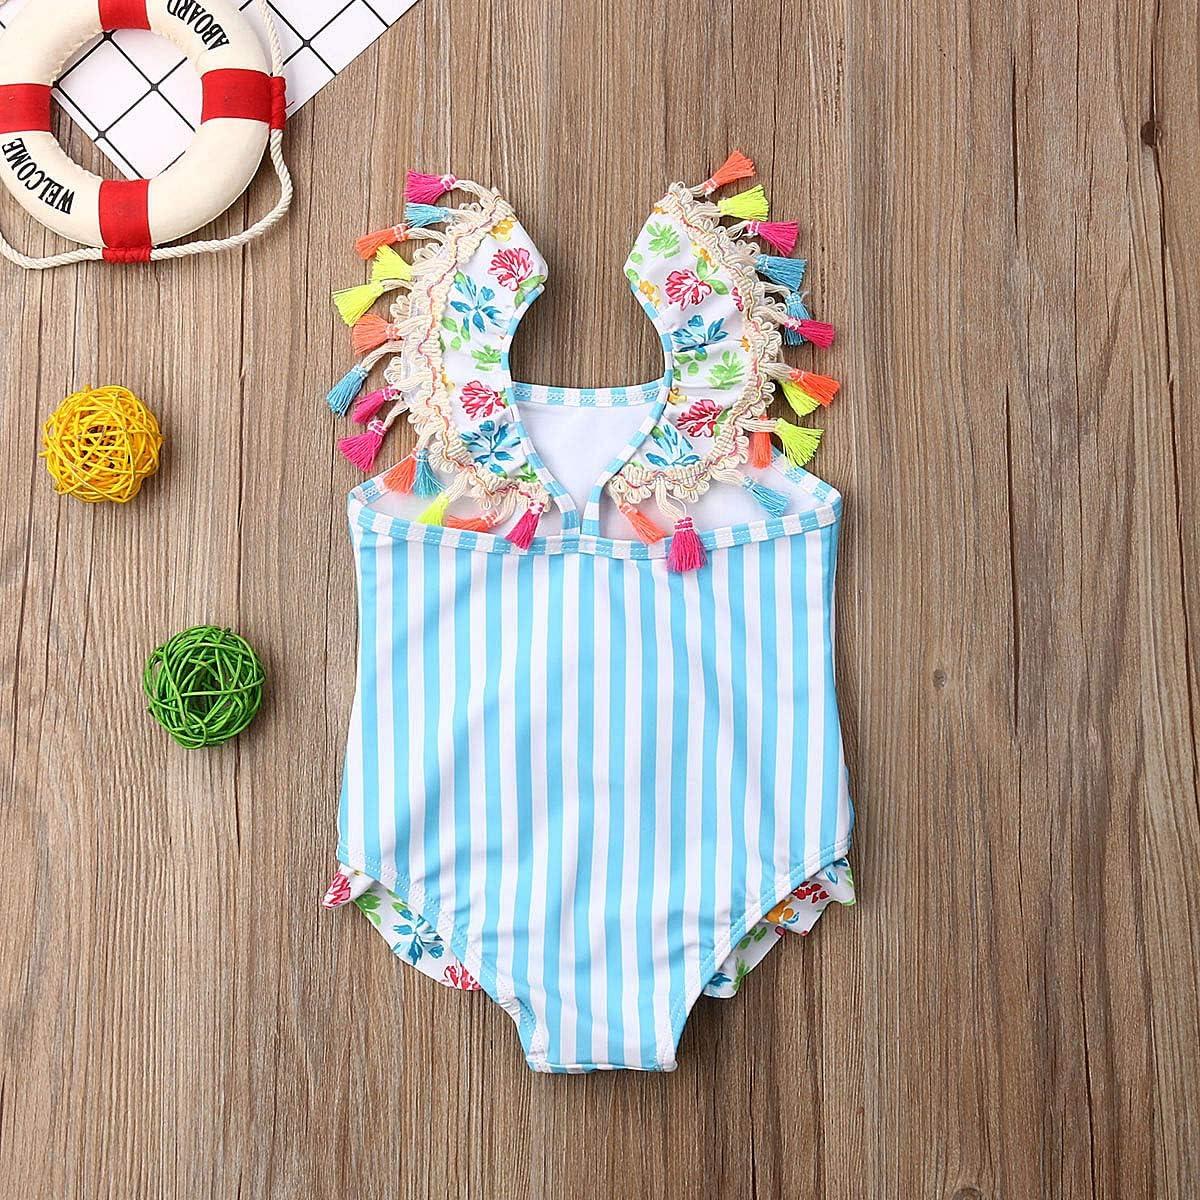 Toddler Baby Girls 2 Pieces Swimsuit Set Swimwear Tops Bikini Bottom Beachwear Bathing Suit